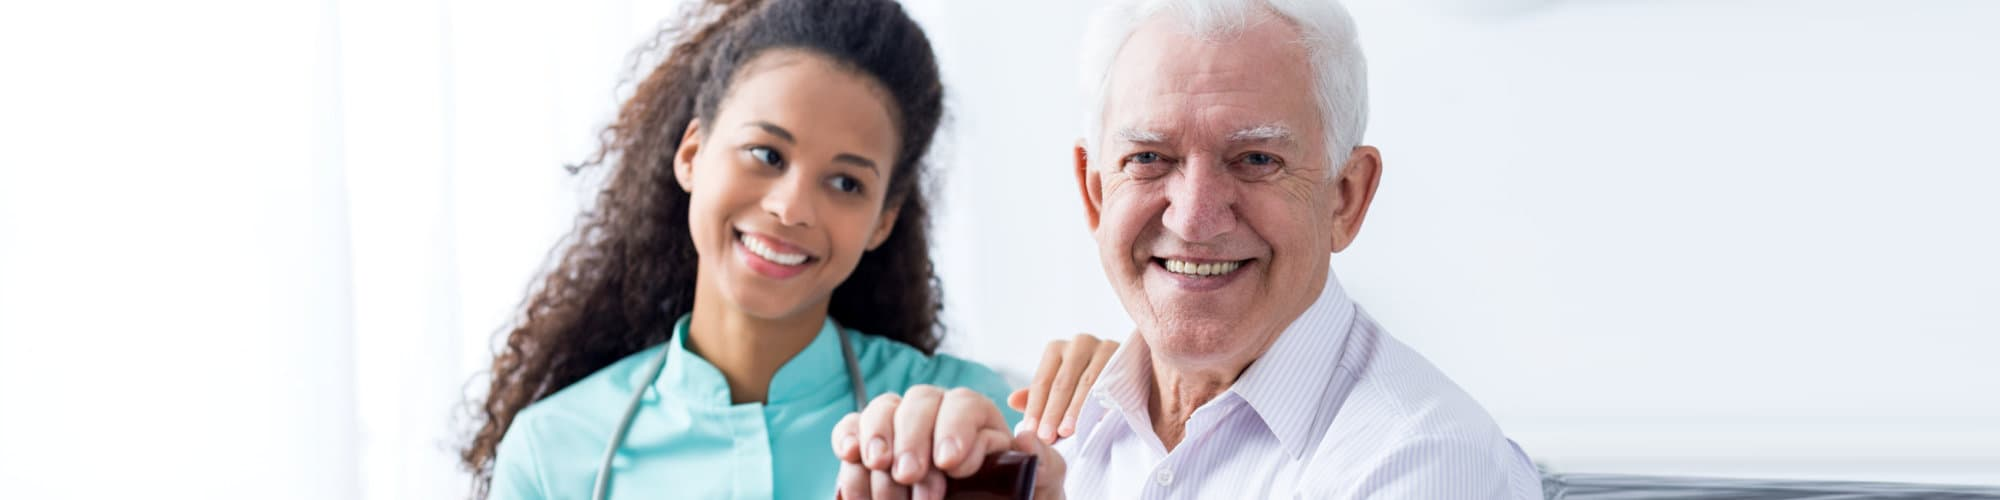 happy nurse taking care of older smiling man